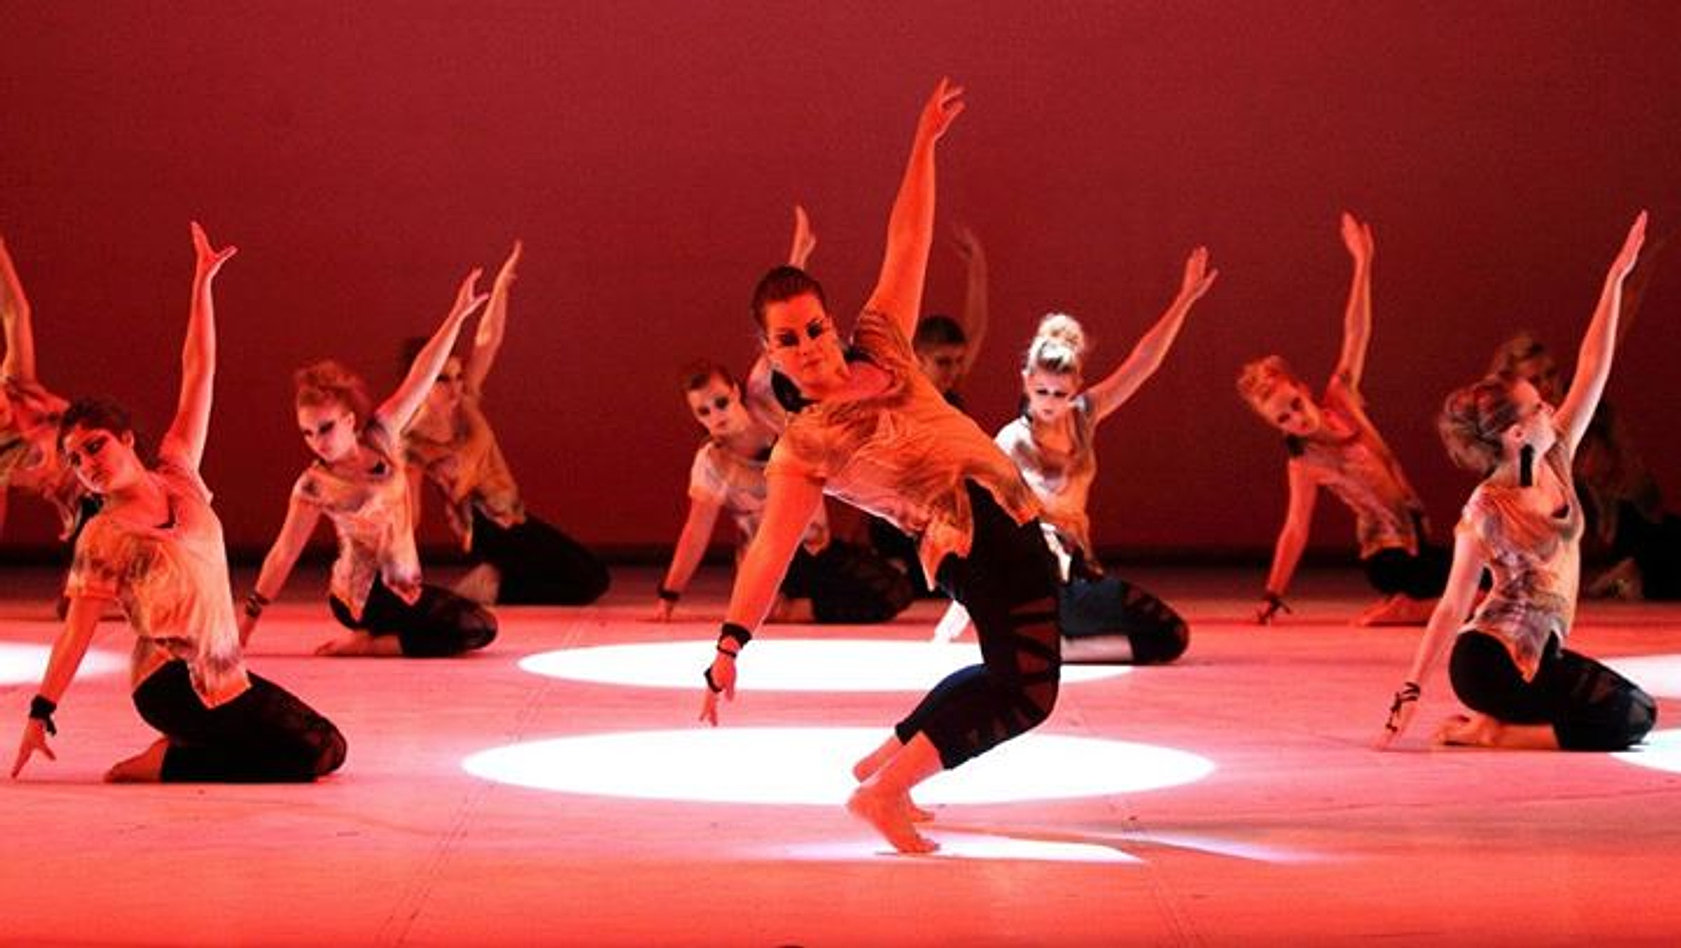 Gift Of Dance -Dance Studio Durbanville - Kids dance classes